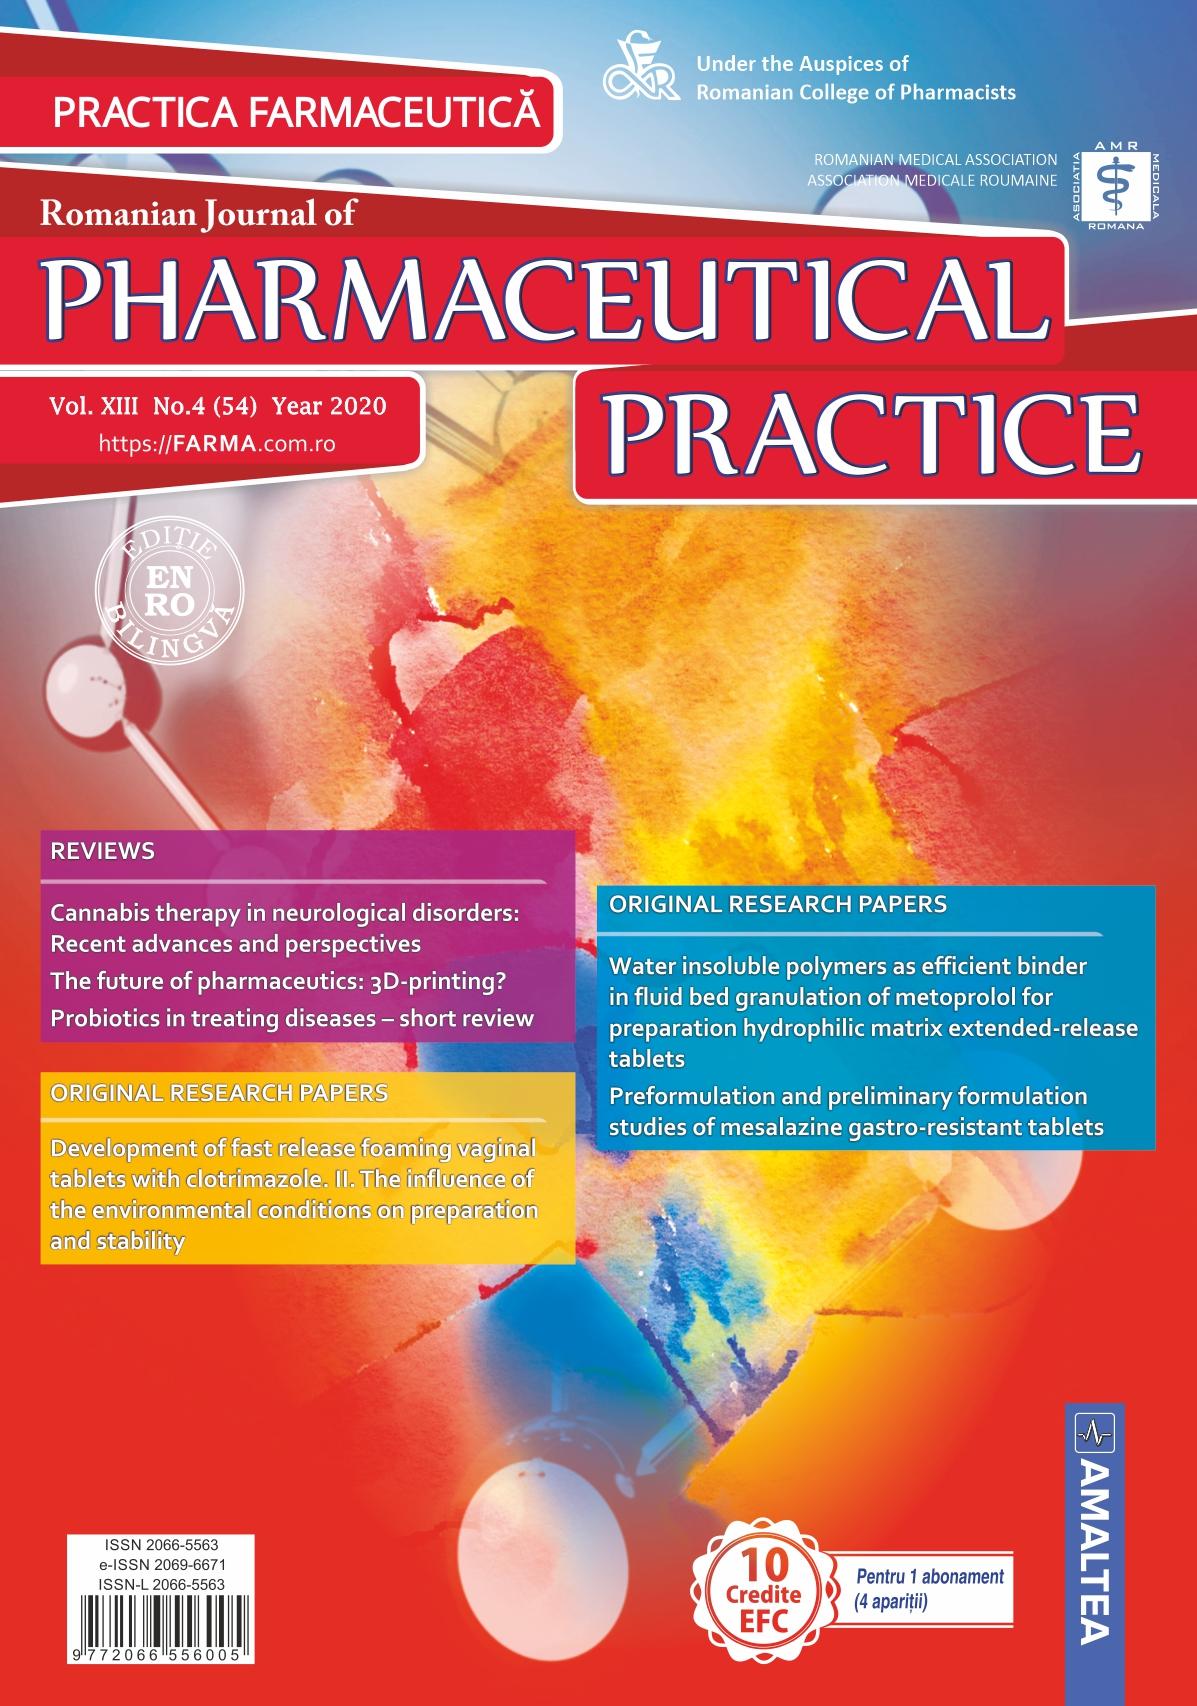 Romanian Journal of Pharmaceutical Practice - Practica Farmaceutica, Vol. XIII, No. 4 (54), 2020